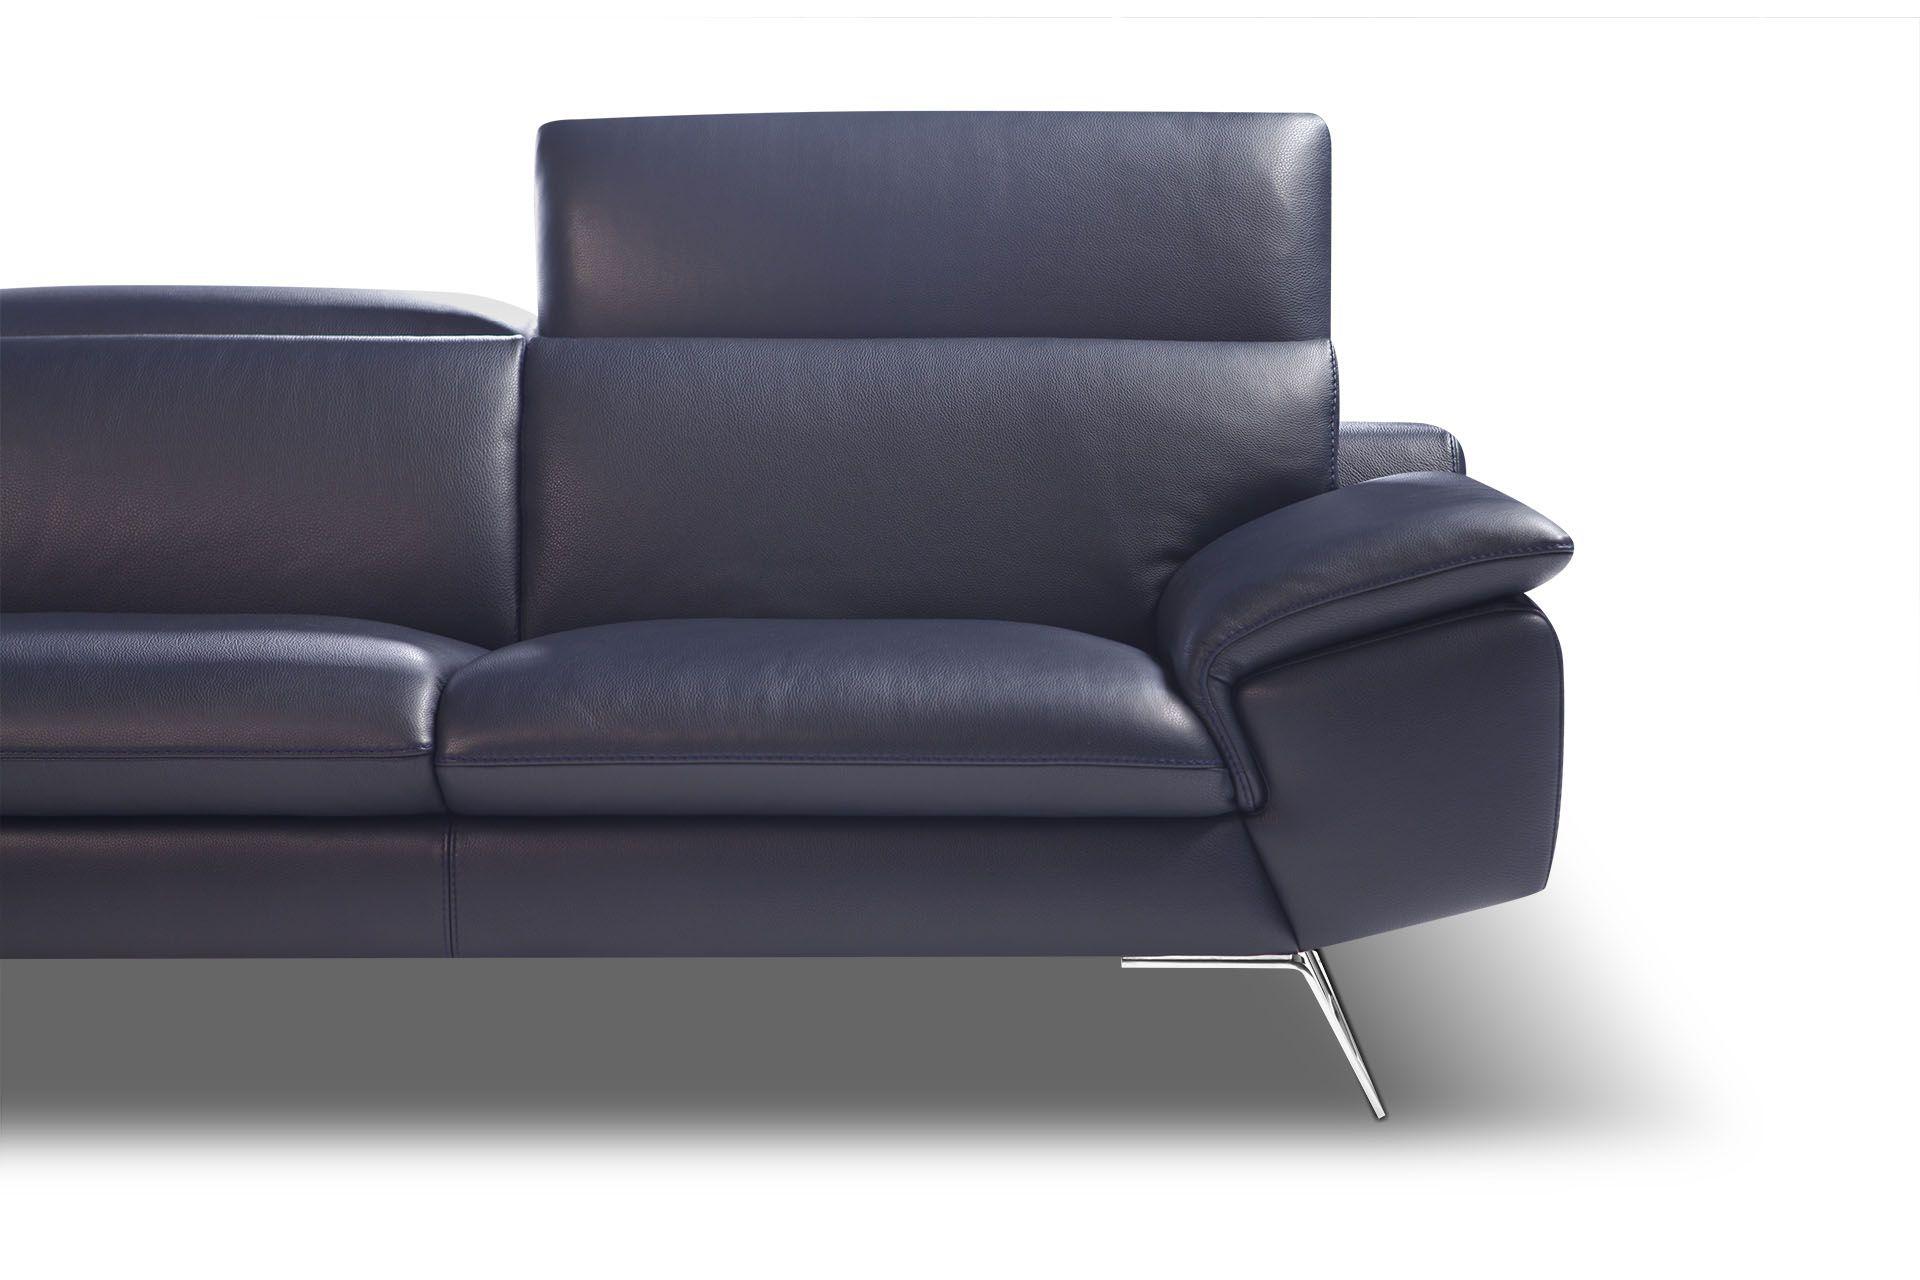 Zuma Nicoletti Home Table Chair Pinterest Sofa Furniture  # Muebles Rattan Medellin